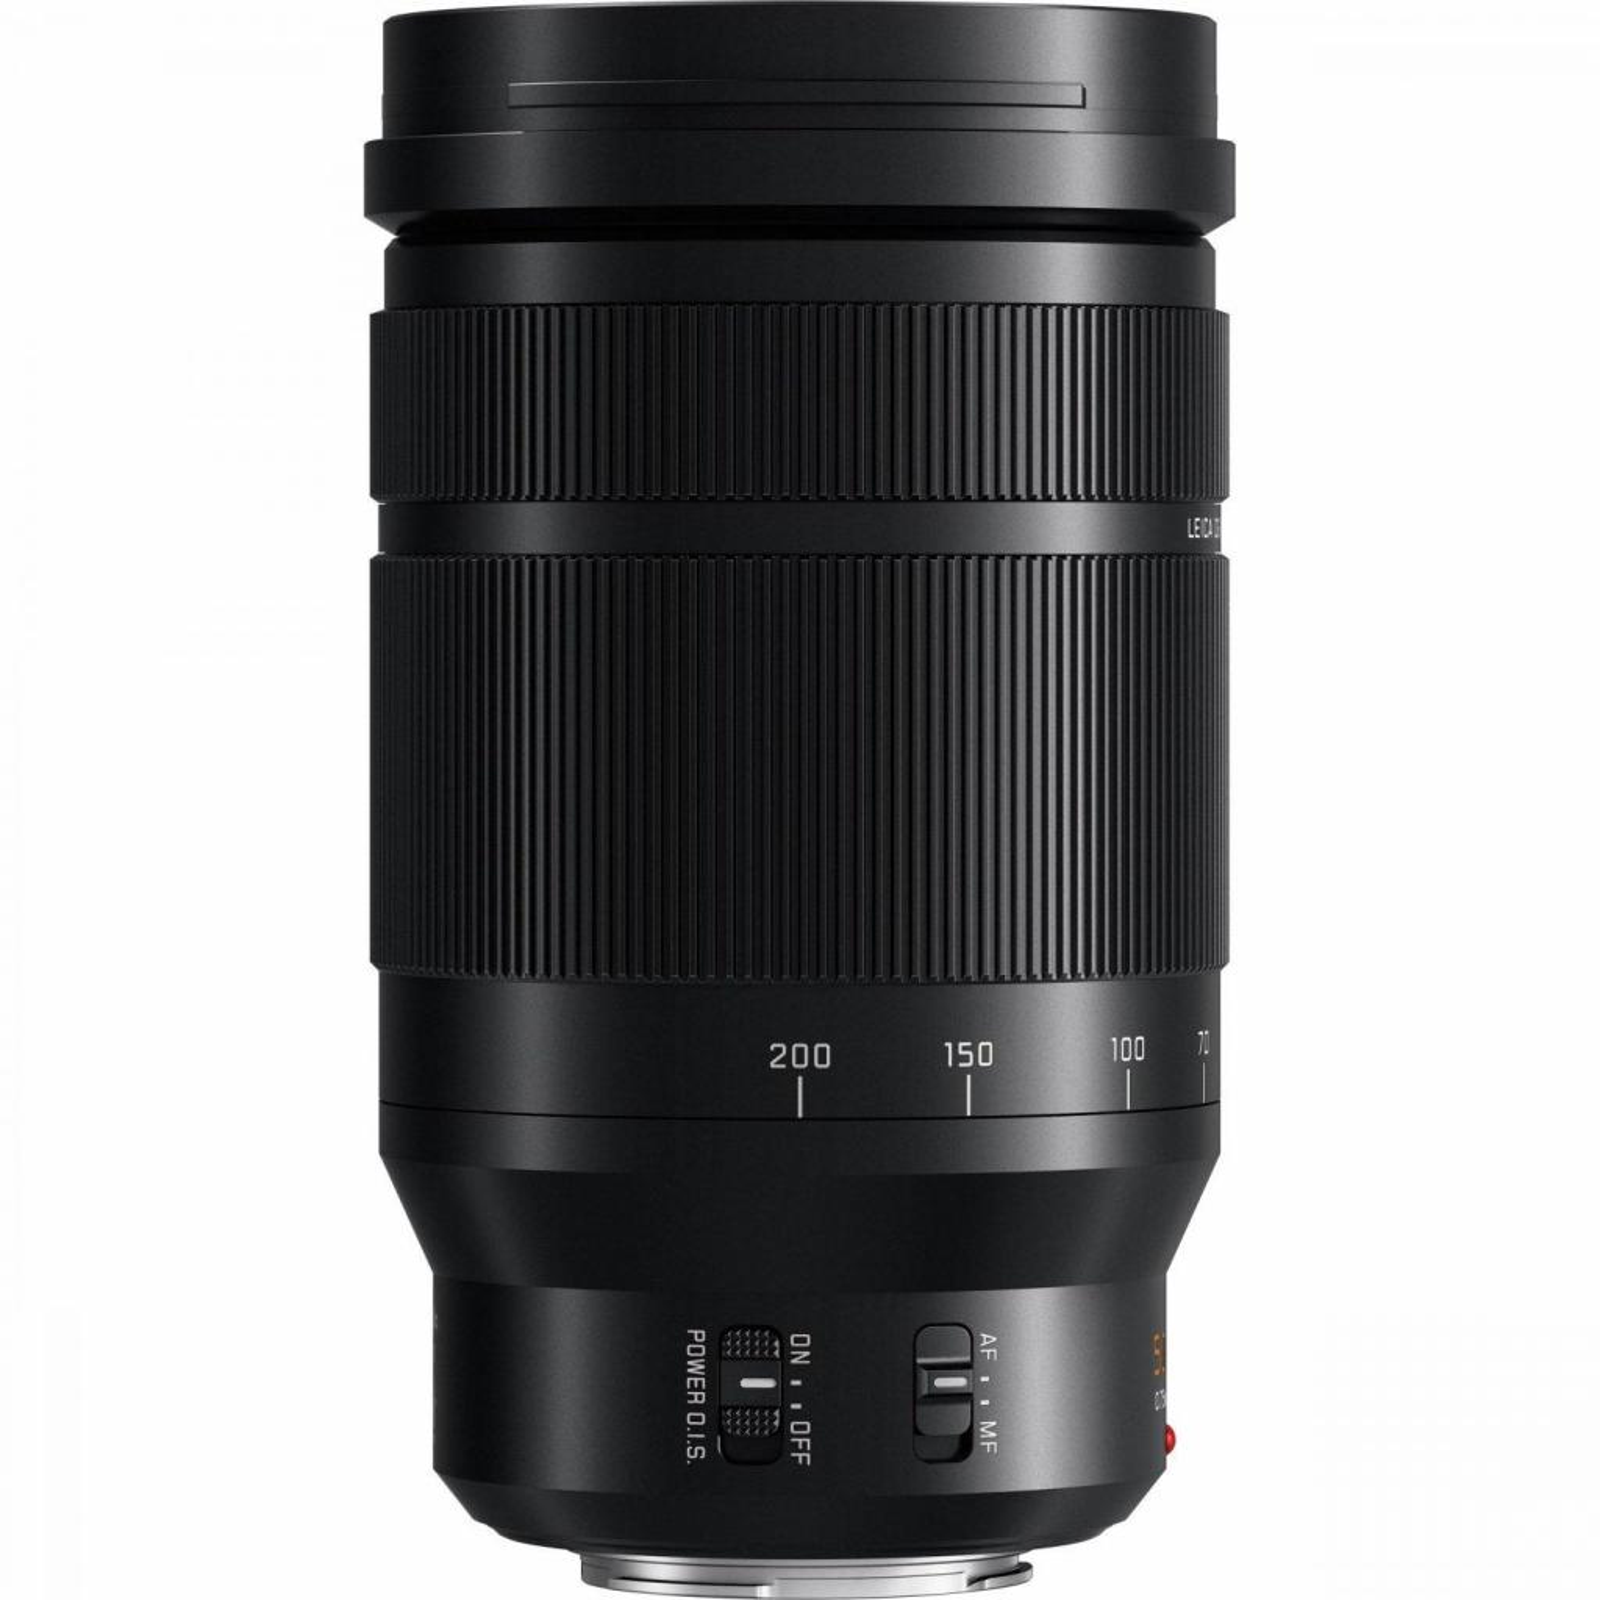 Объектив PANASONIC Micro 4/3 Lens 50-200 mm f/2.8-4 ASPH. POWER O.I.S. Leica DG (H-ES50200E) изображение 4